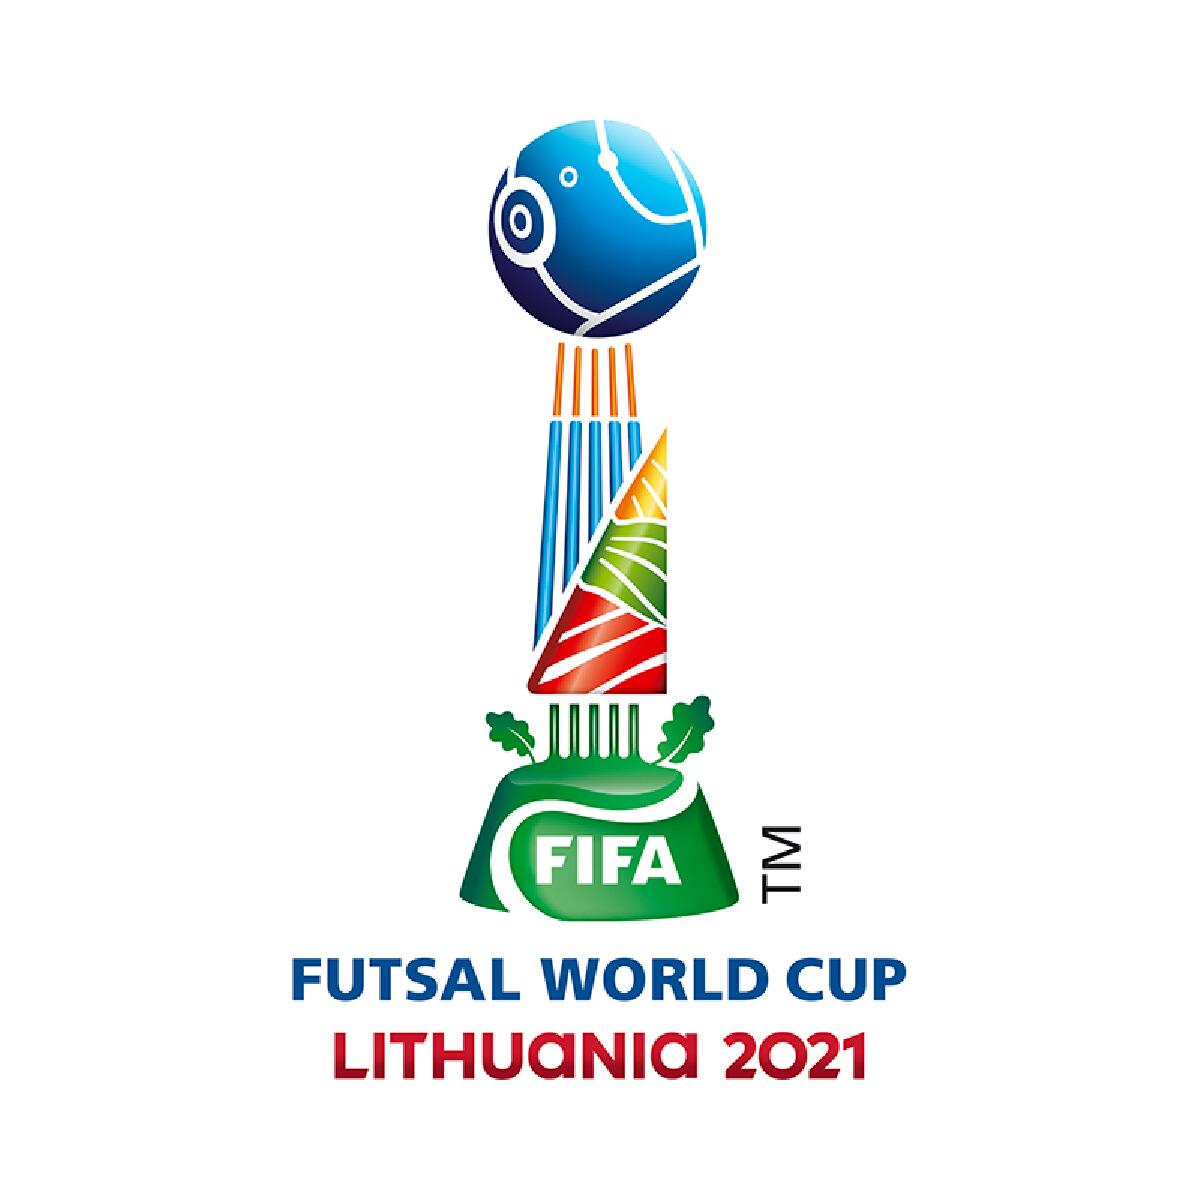 FIFA Futsal World Cup Lithuania 2021